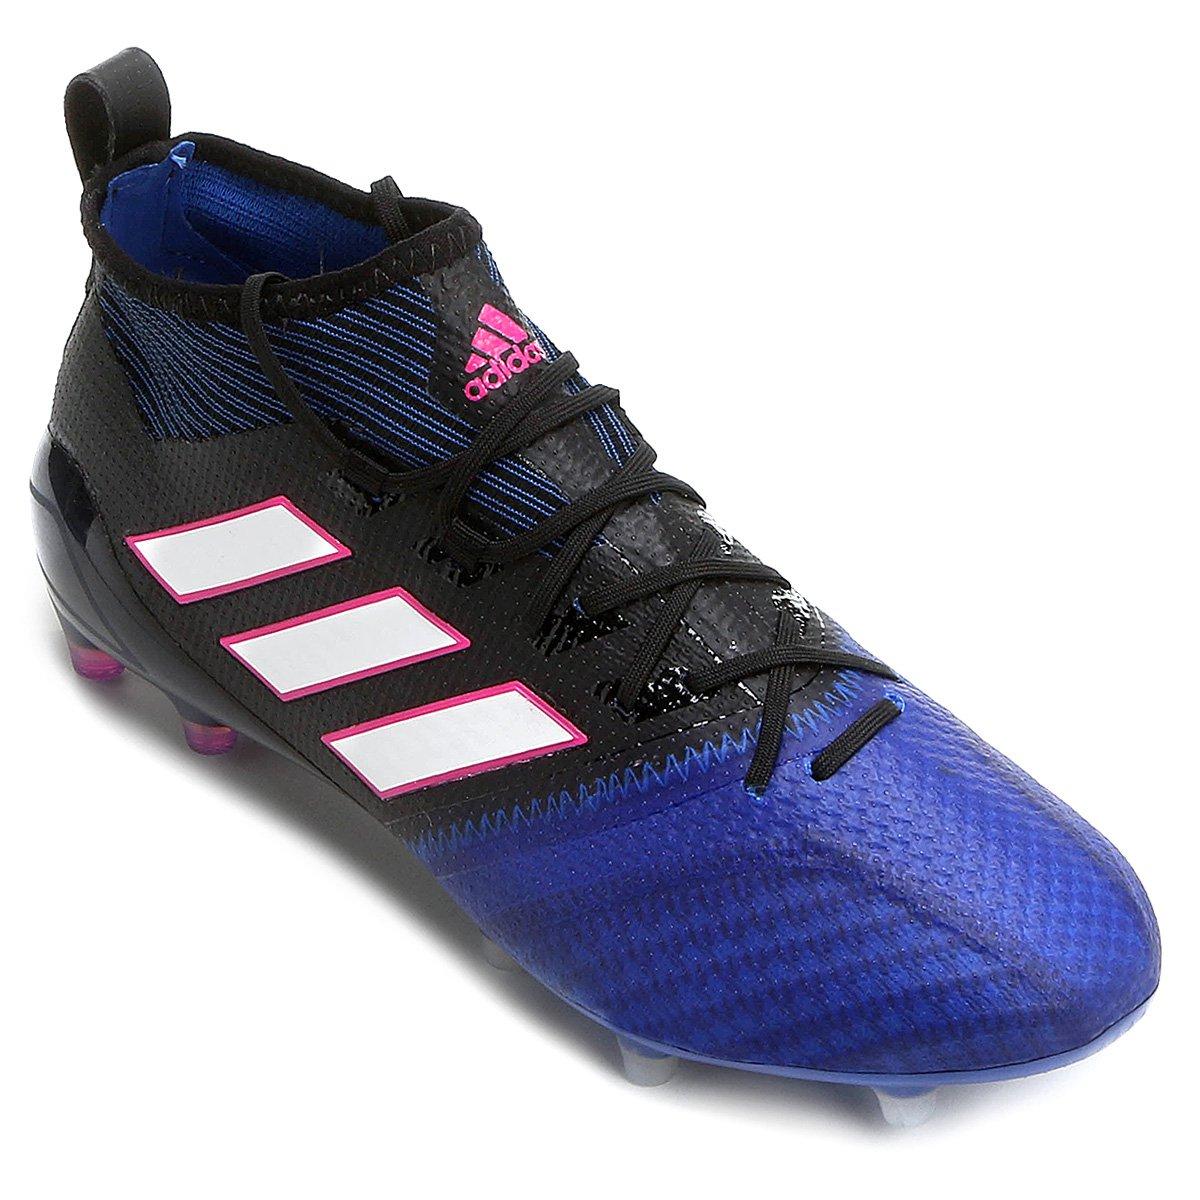 227dab312c ... Chuteira Campo Adidas Ace 17.1 Primeknit FG Masculina ... uk store  255d7 c0680 ...